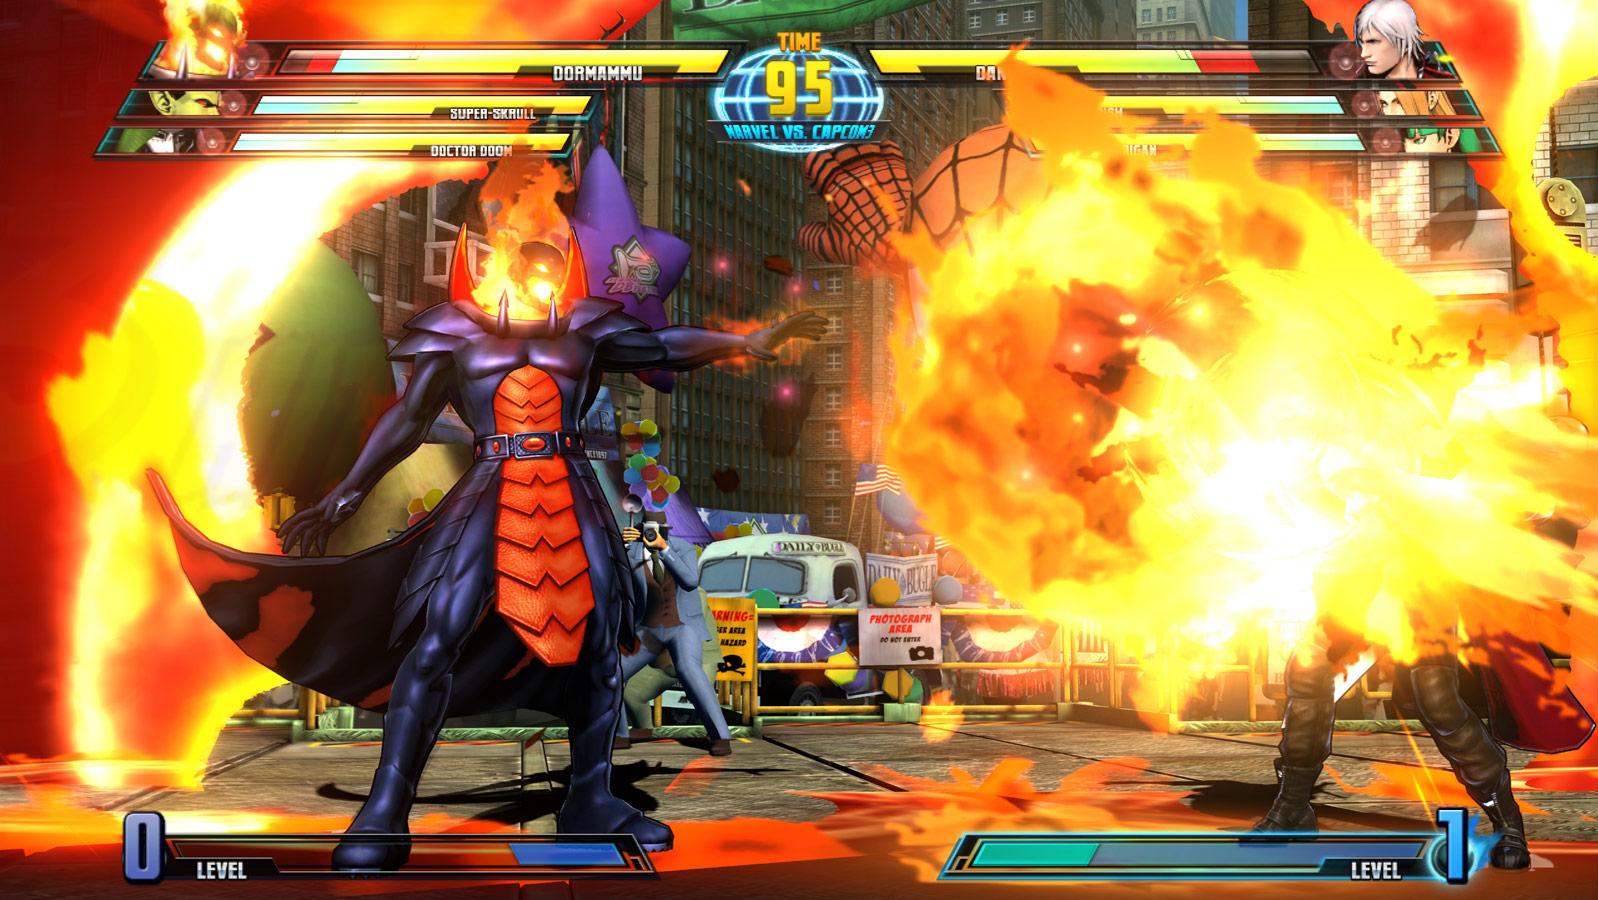 Marvel vs. Capcom 3 screen shot Aug. 18 image #8